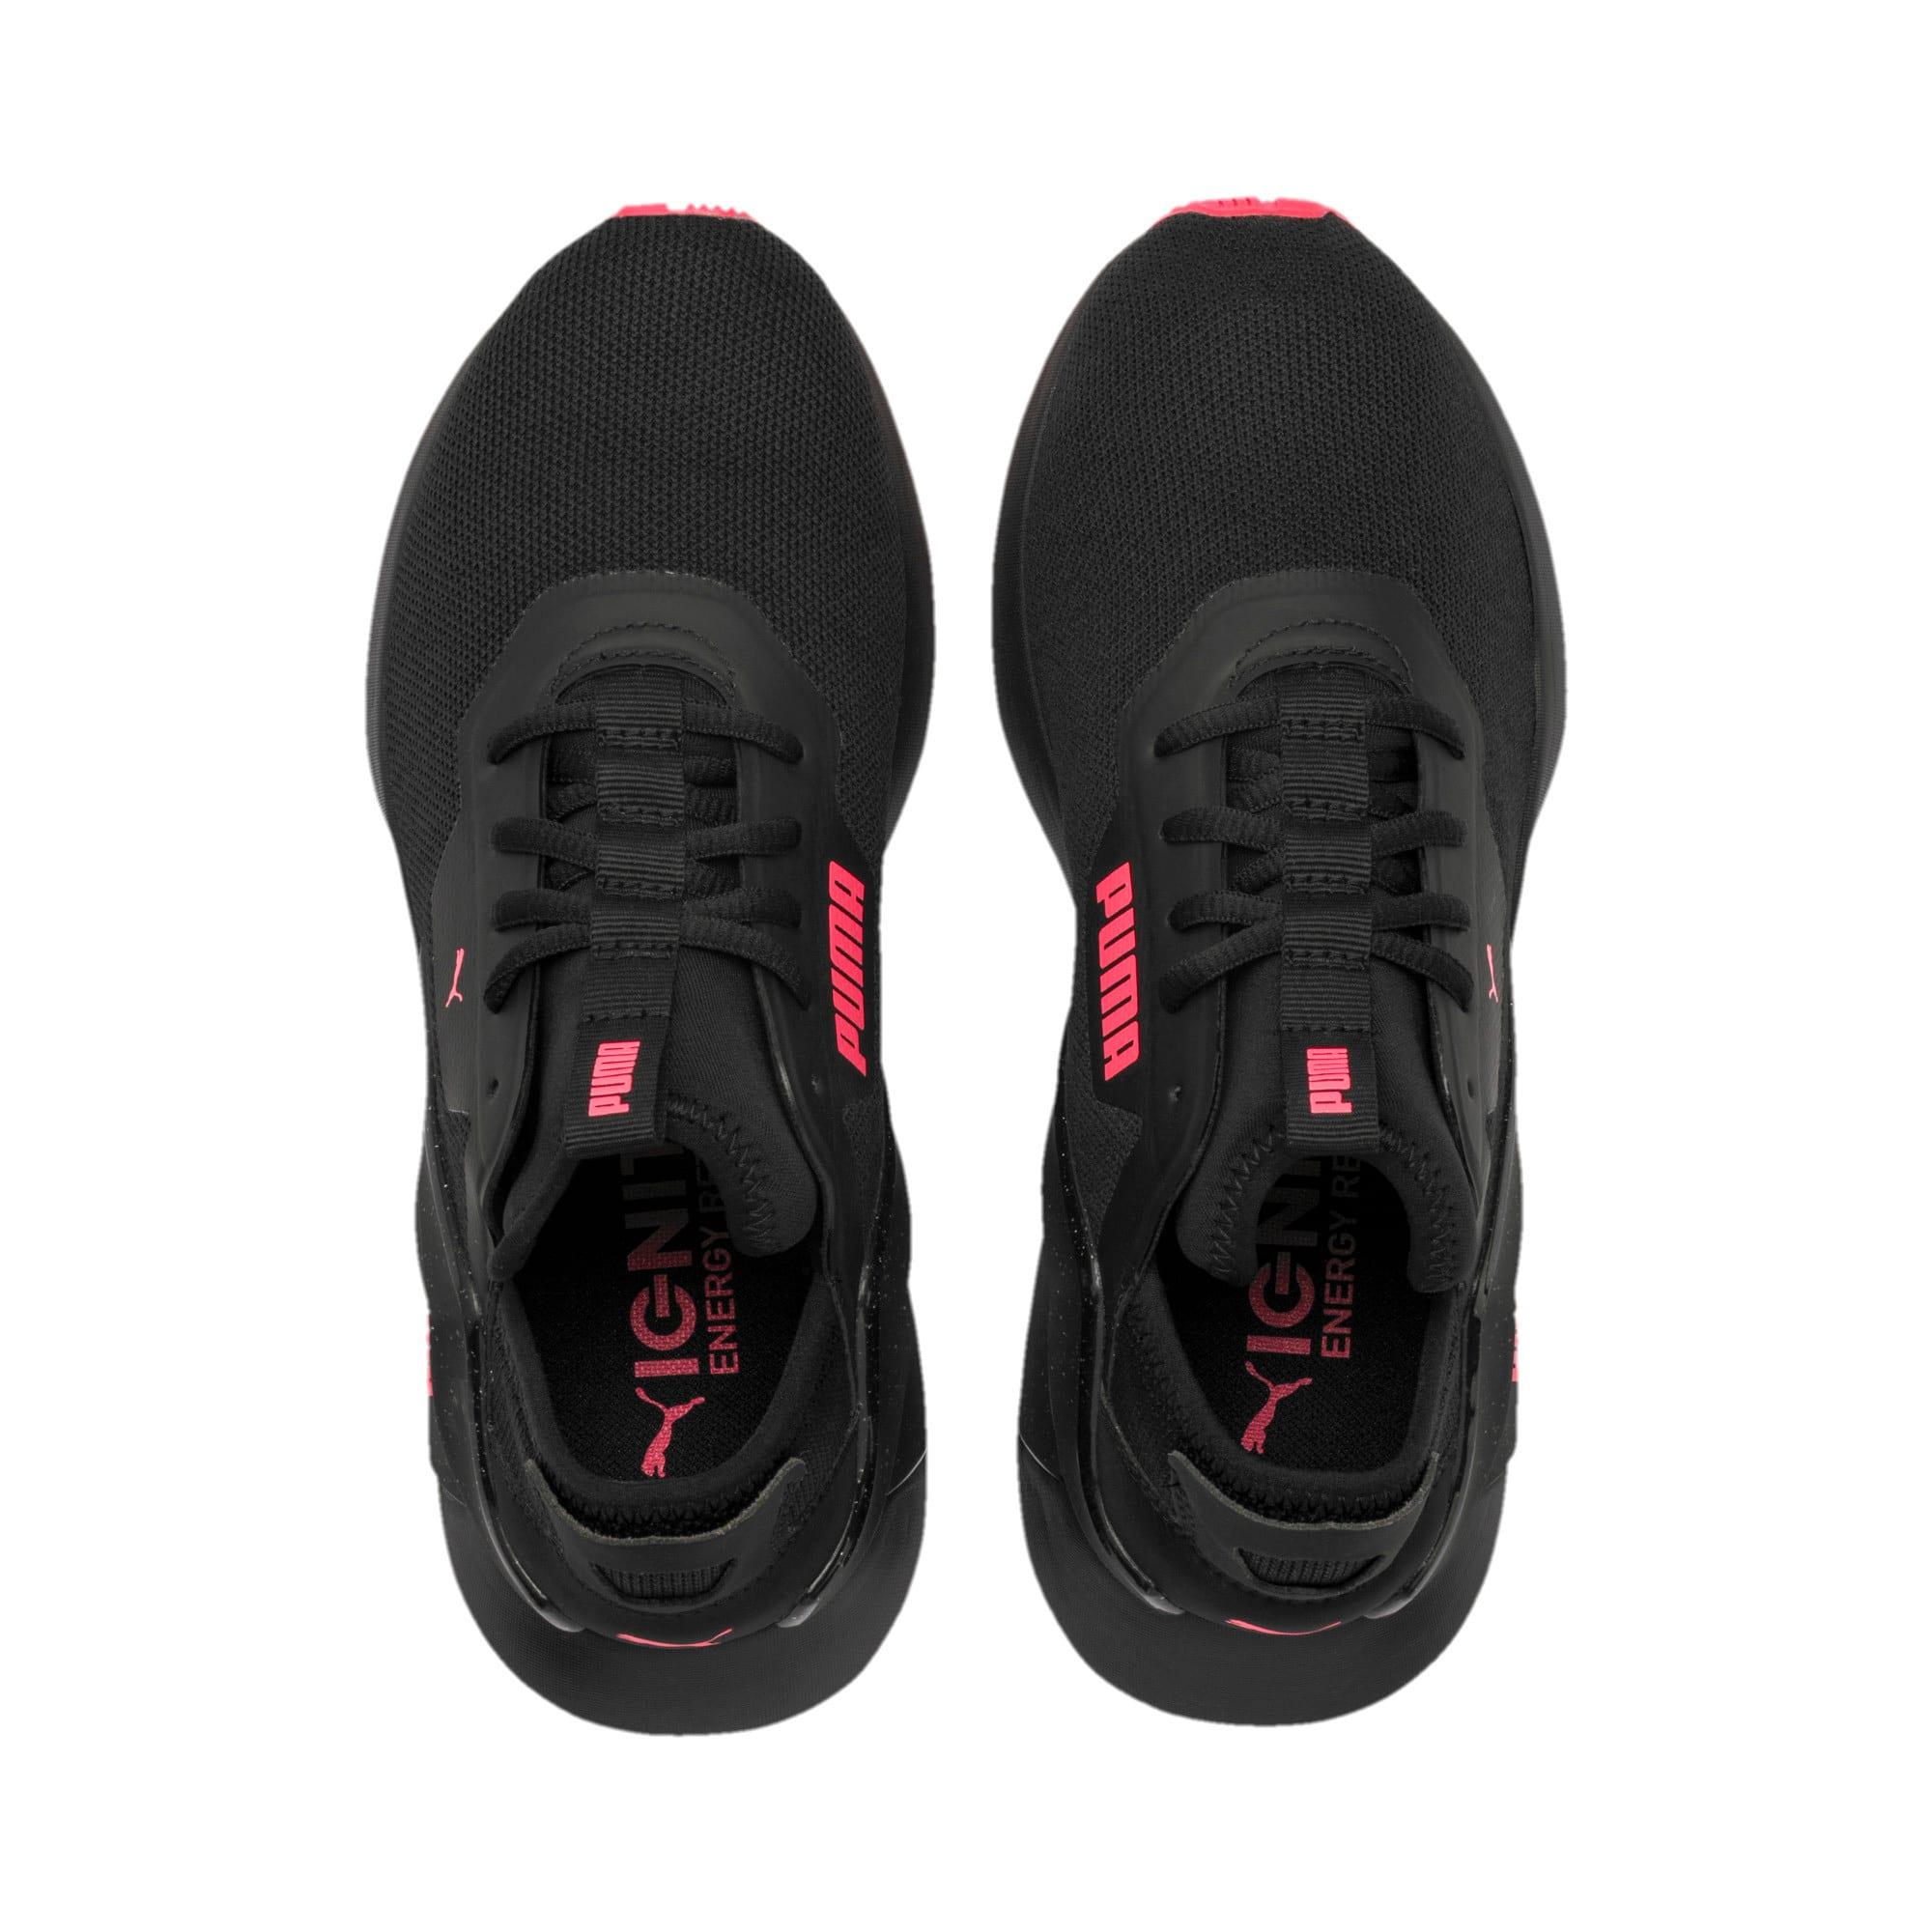 Thumbnail 8 of Rogue X Knit Women's Running Shoes, Puma Black-Pink Alert, medium-IND